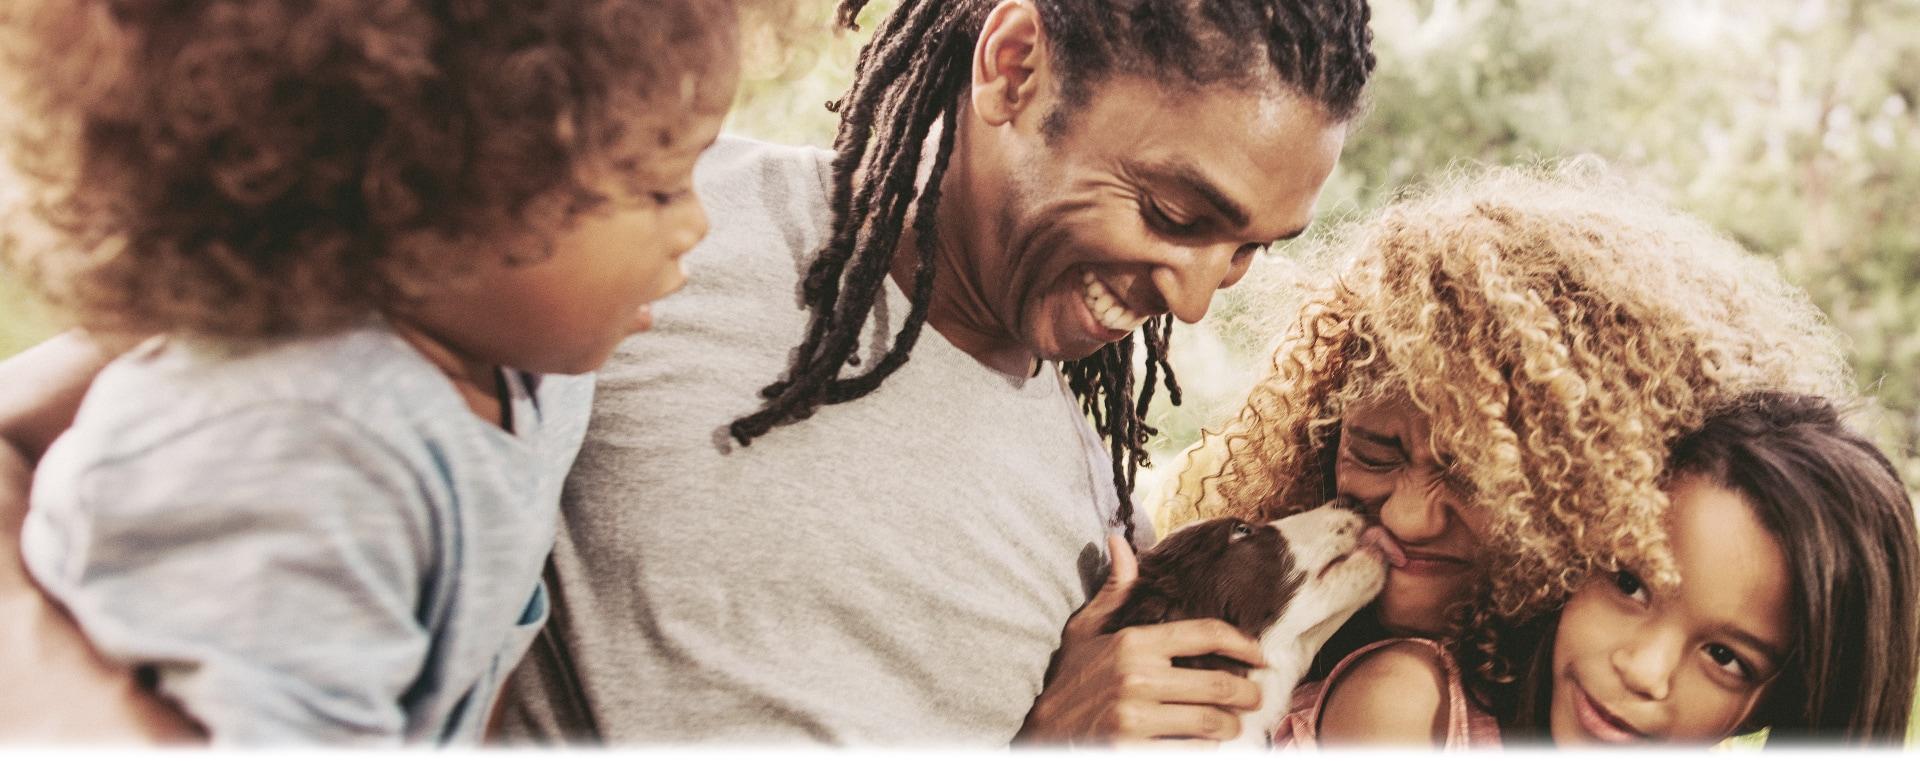 Allergy Shots - Family Allergy & Asthma Clinic Denton, Flower Mound